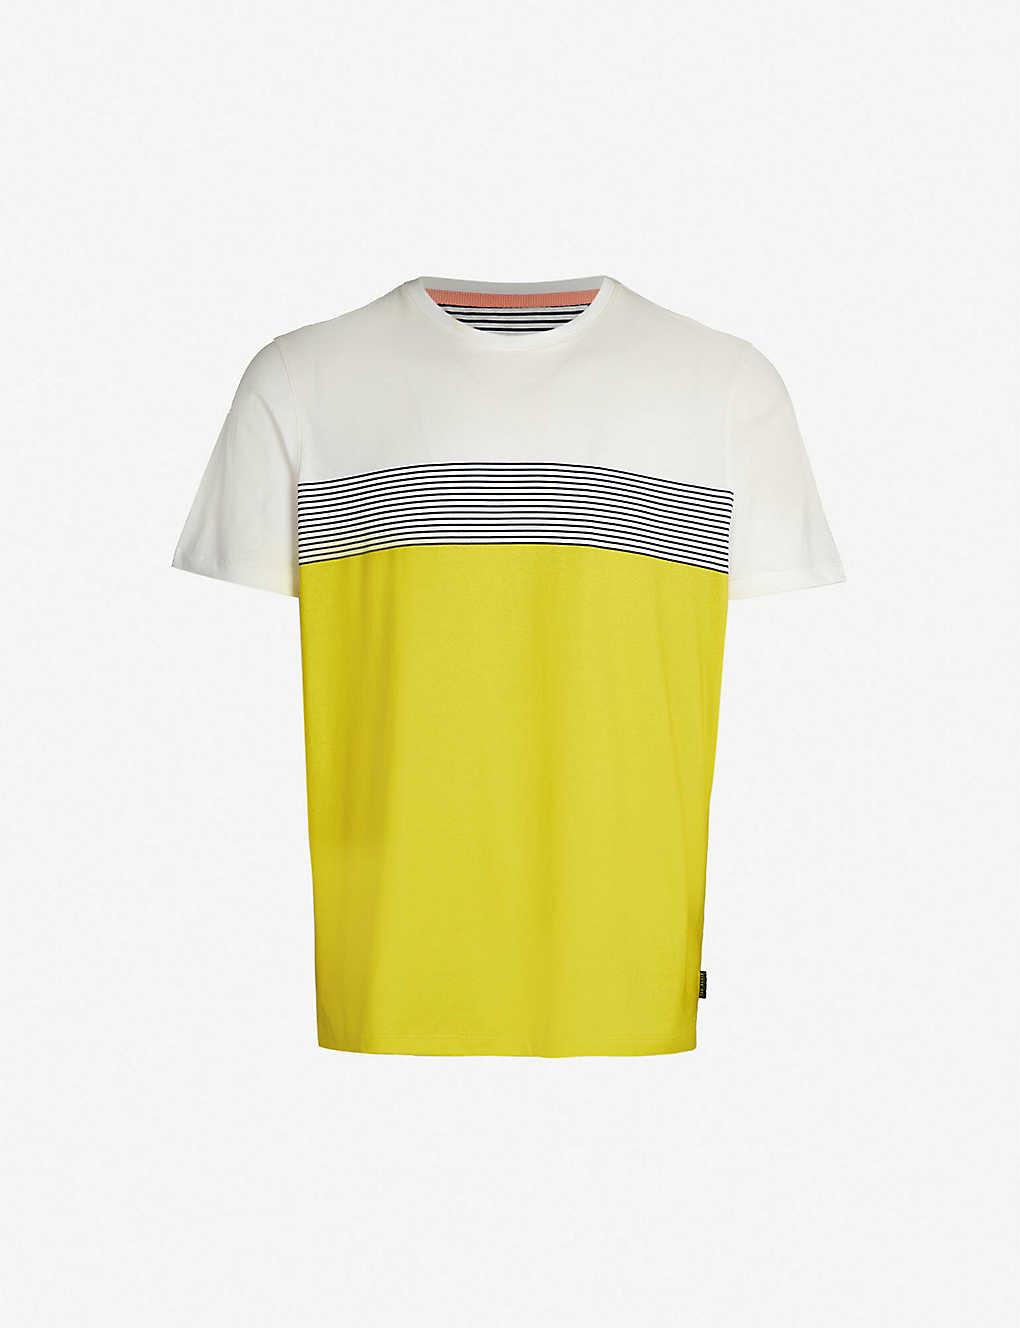 cb49b16c87 Wabadoo striped cotton-jersey T-shirt